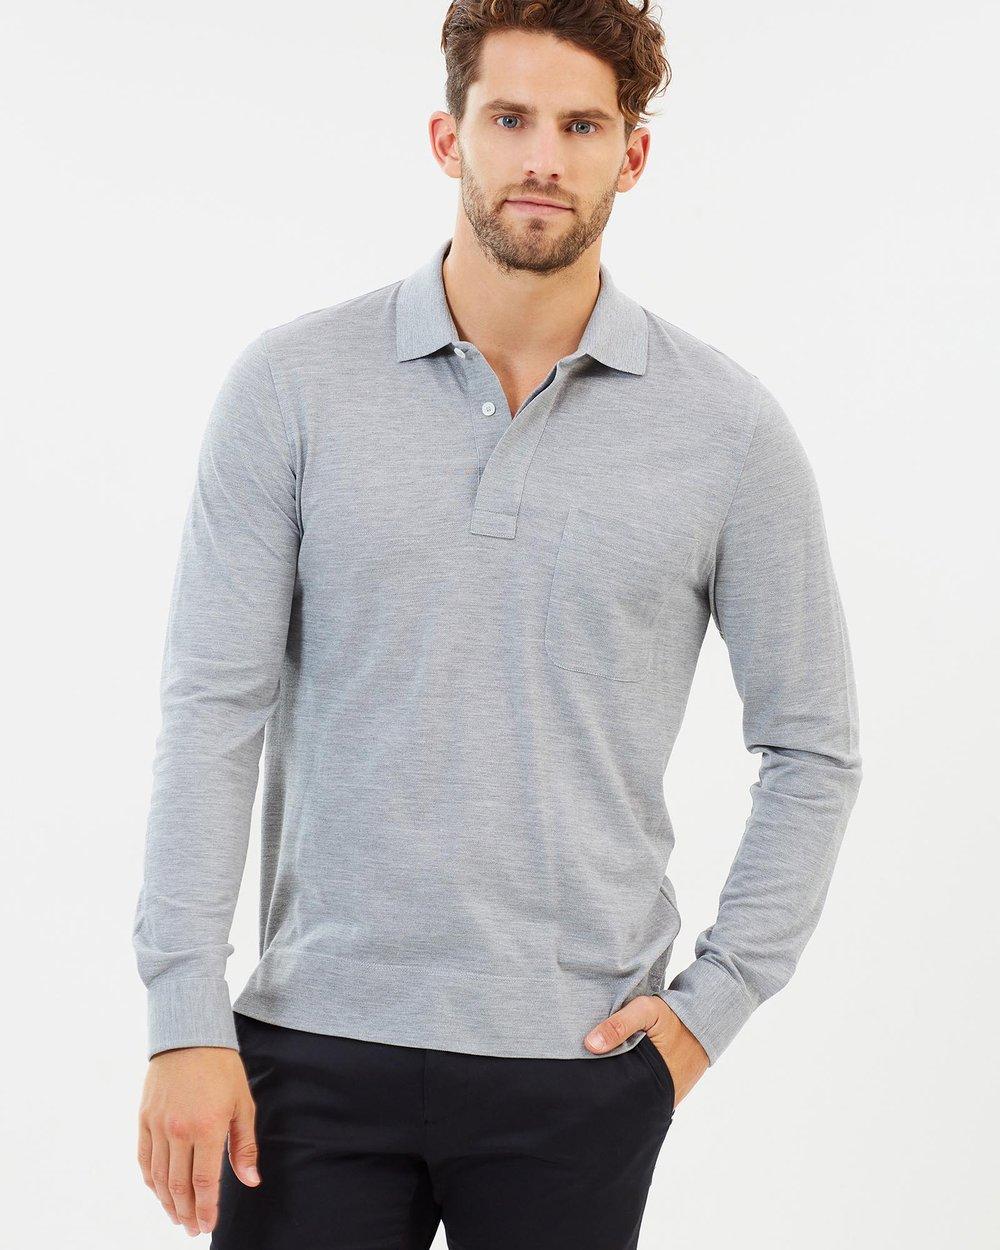 ba1ae1fae Cotton-Silk Blend Long Sleeve Polo Shirt by CERRUTI 1881 Online ...